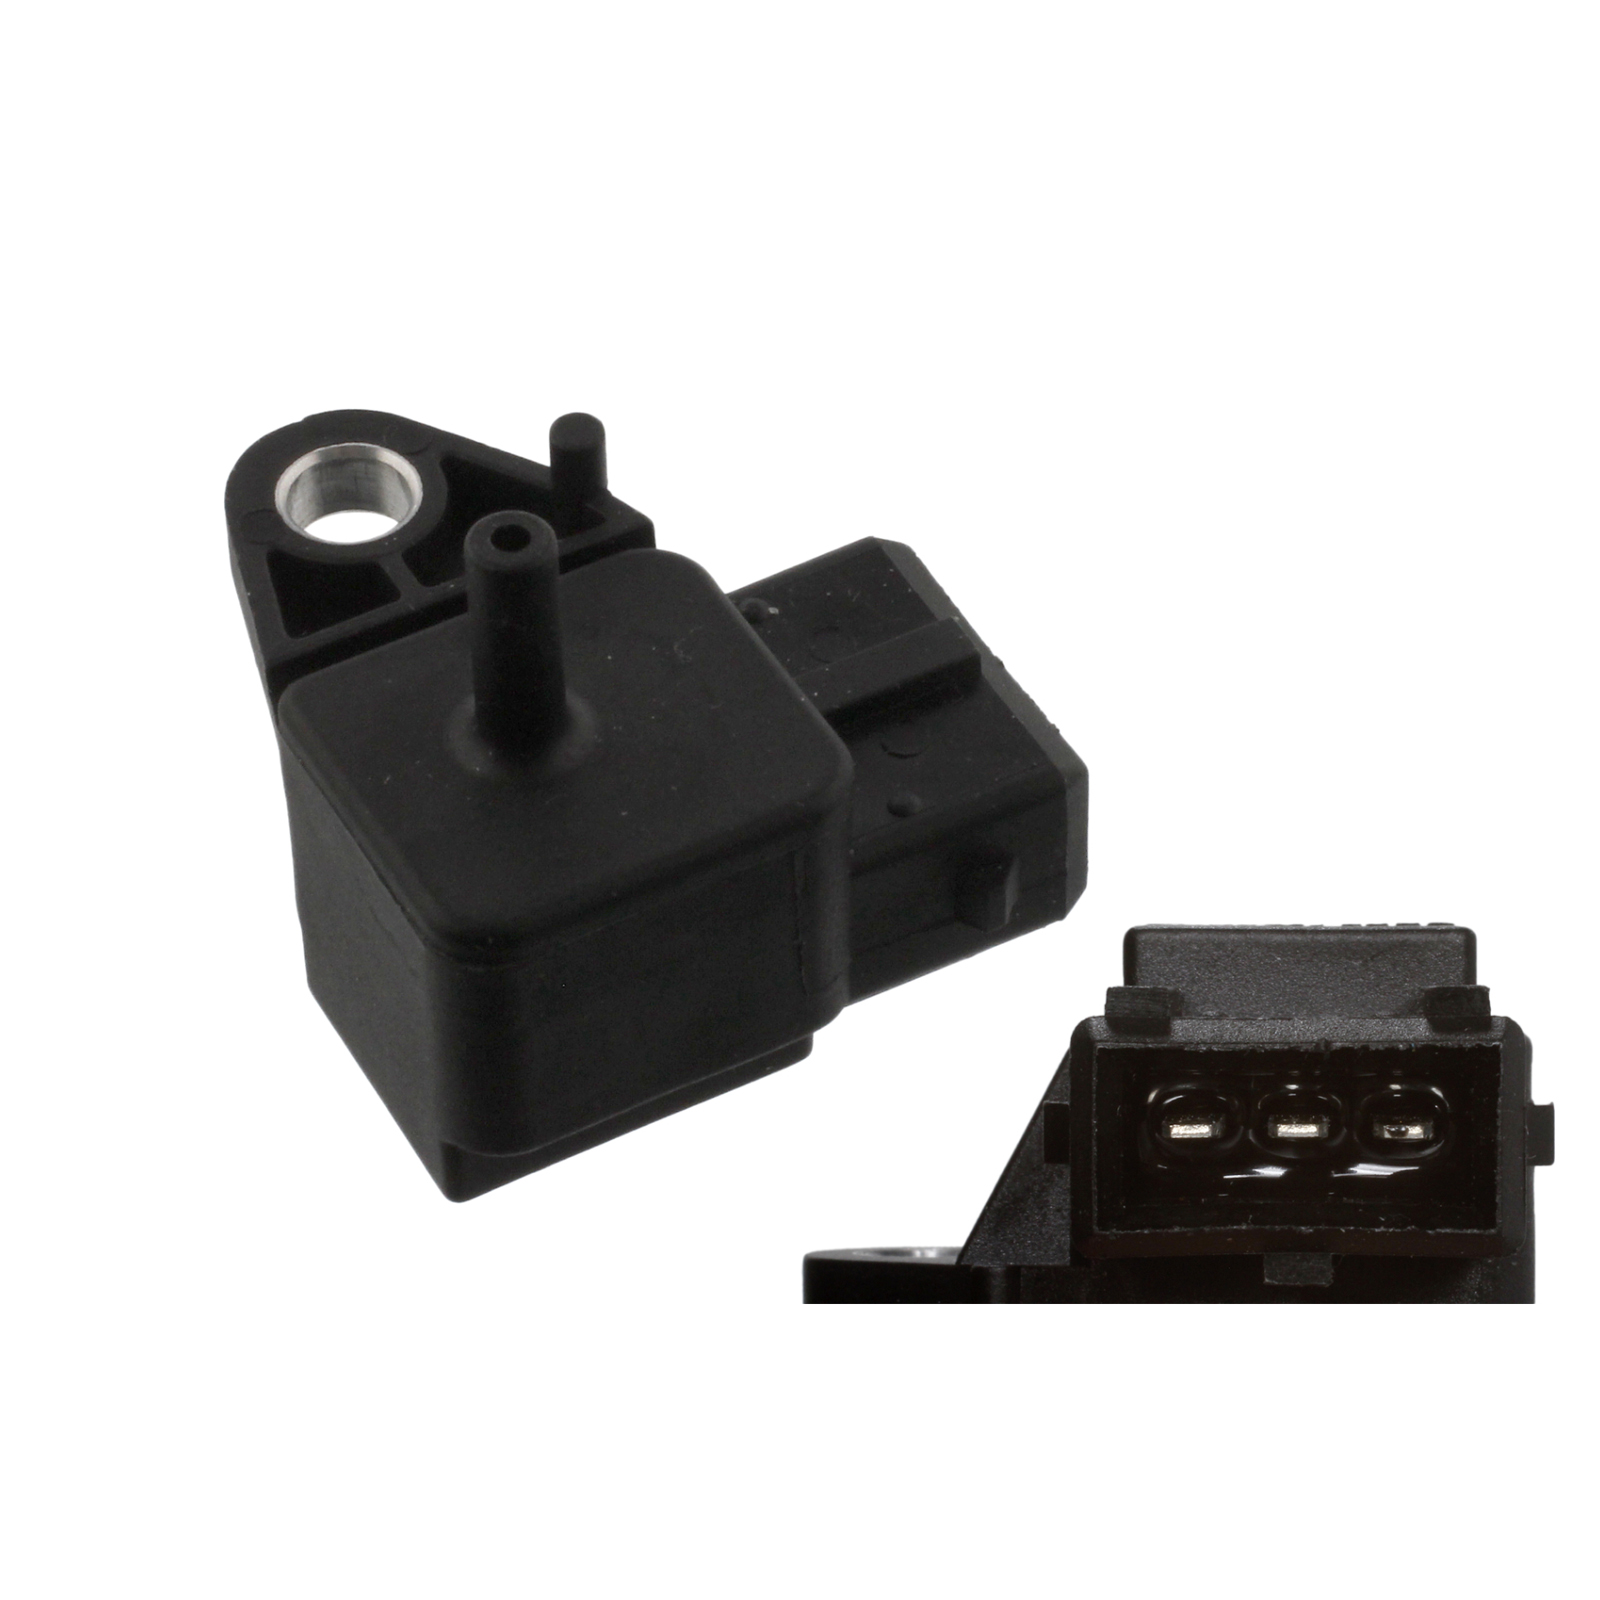 FEBI 37057 Saugrohrdrucksensor MERCEDES W202 W168 W124 W140 Vito 638 Sprinter 2t-4t 903